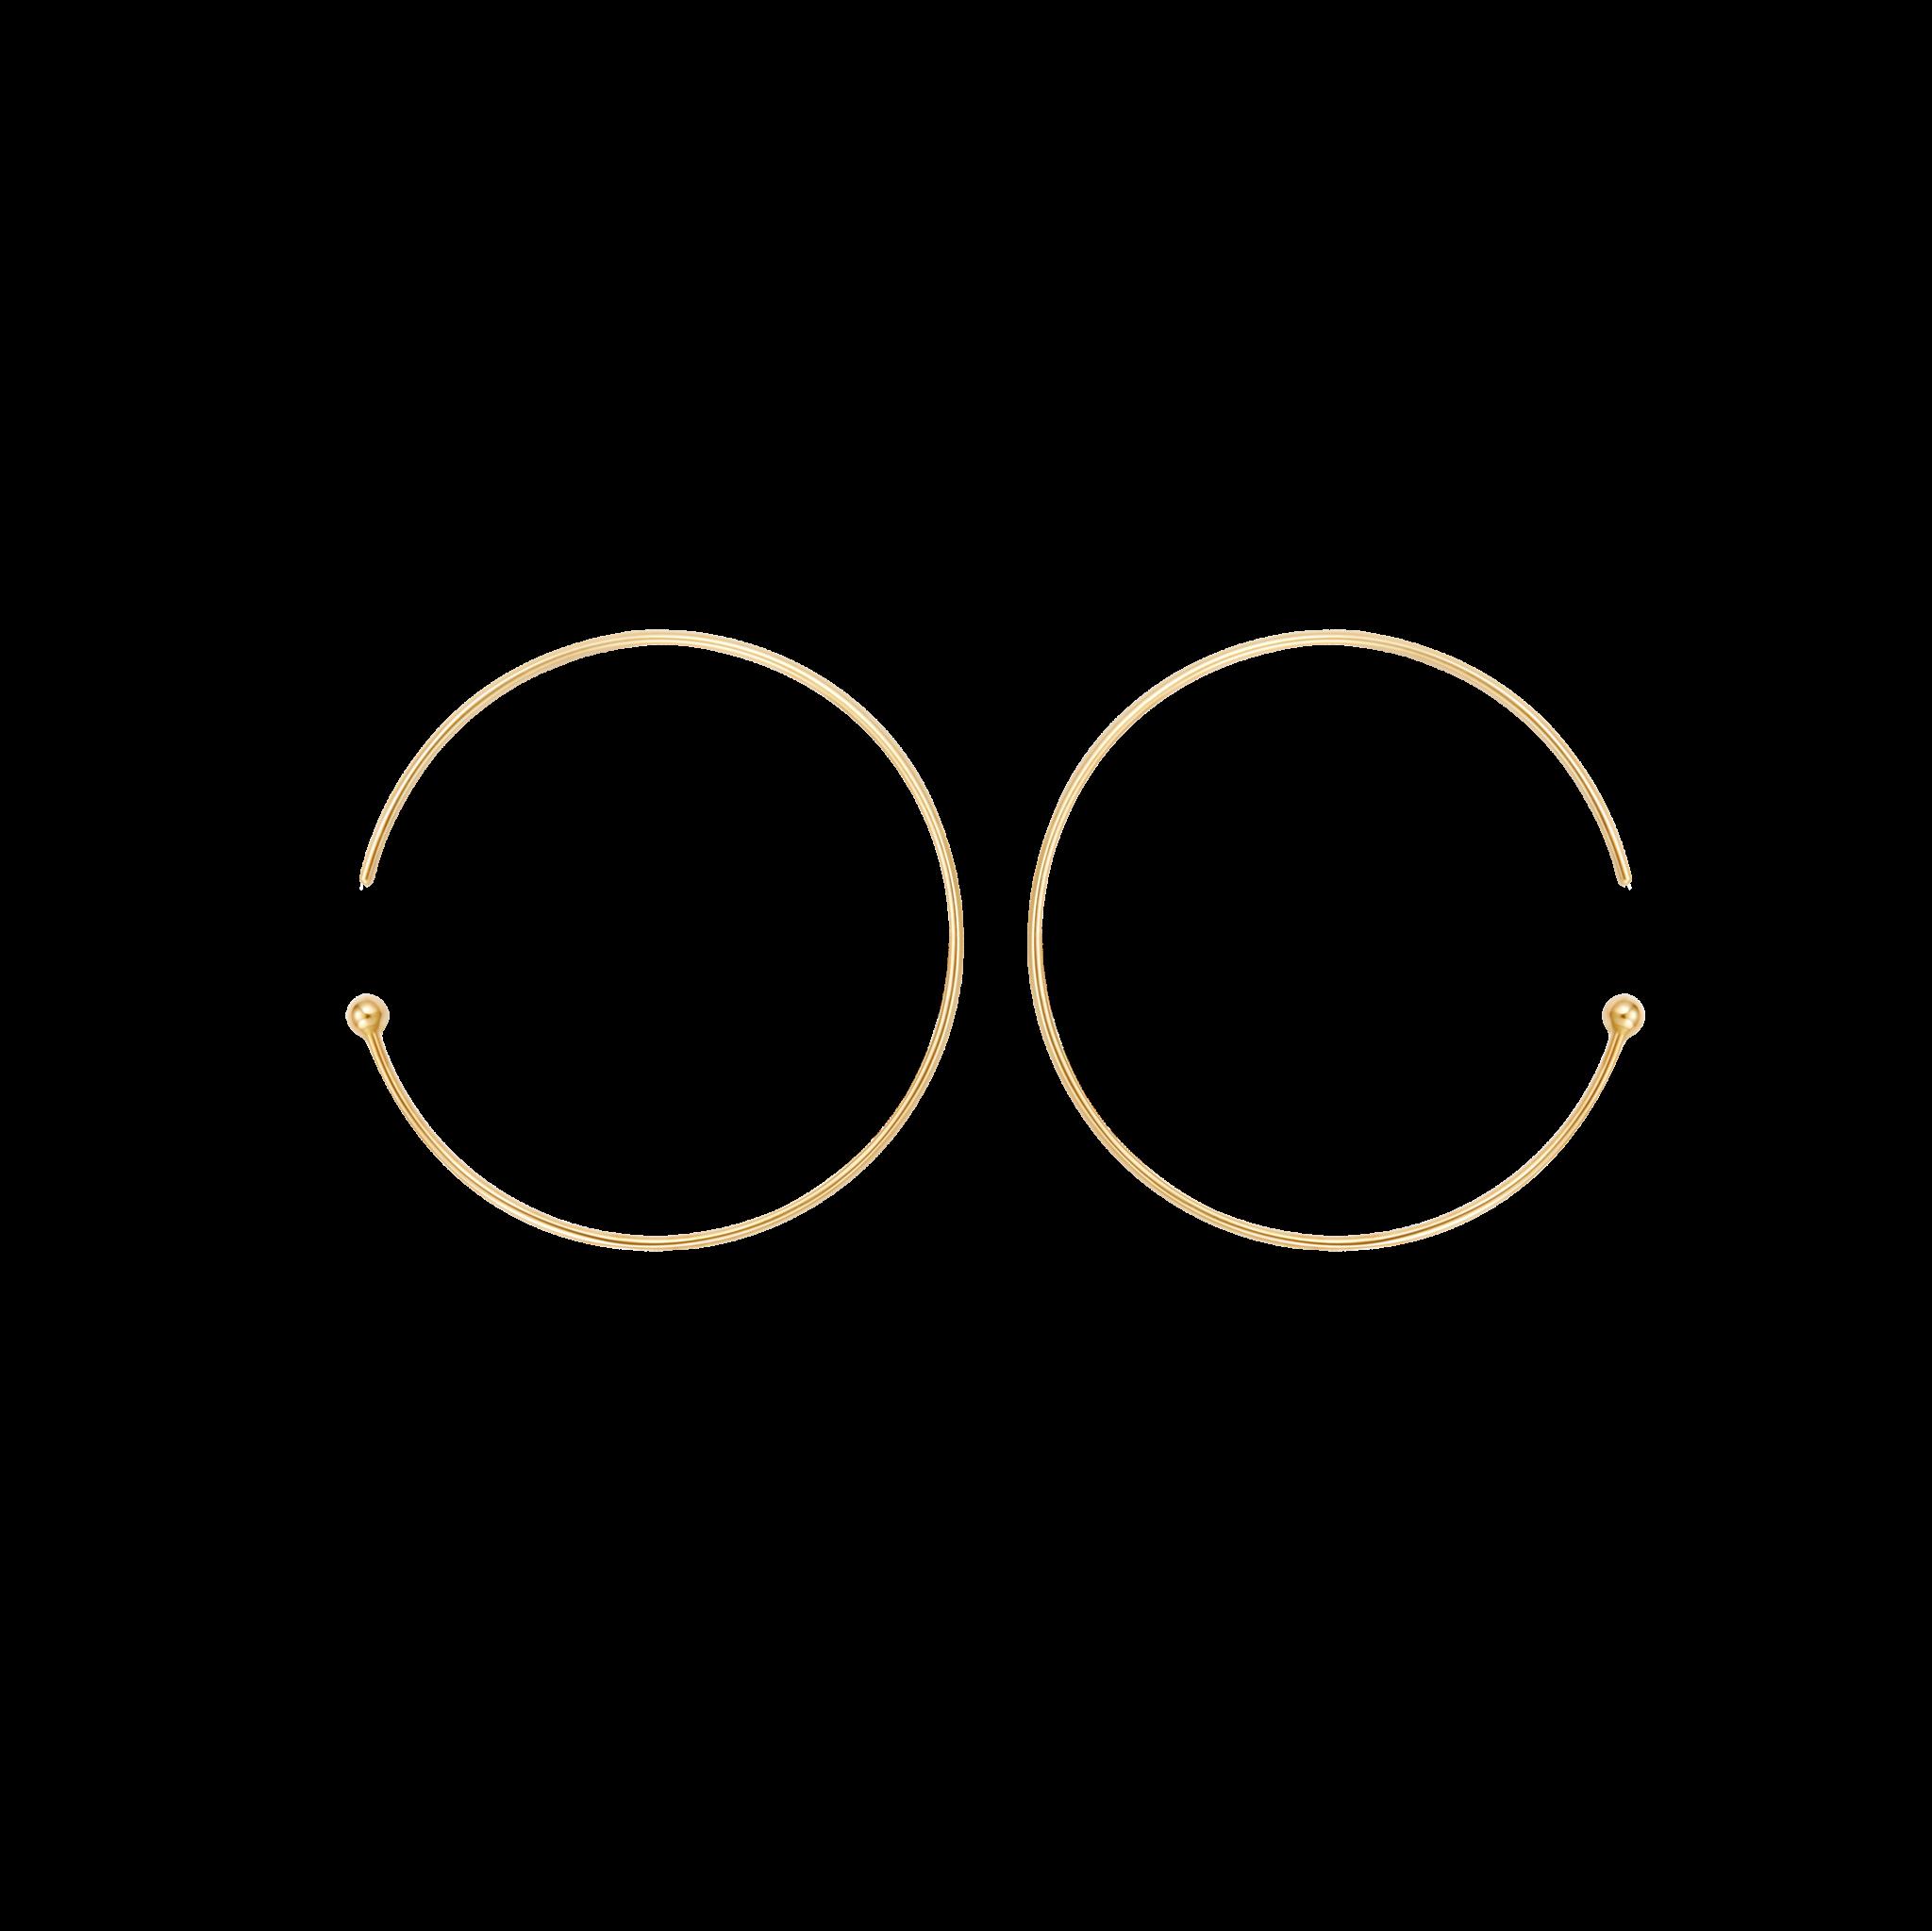 Resonance Collection 10K半圆形耳环 1299